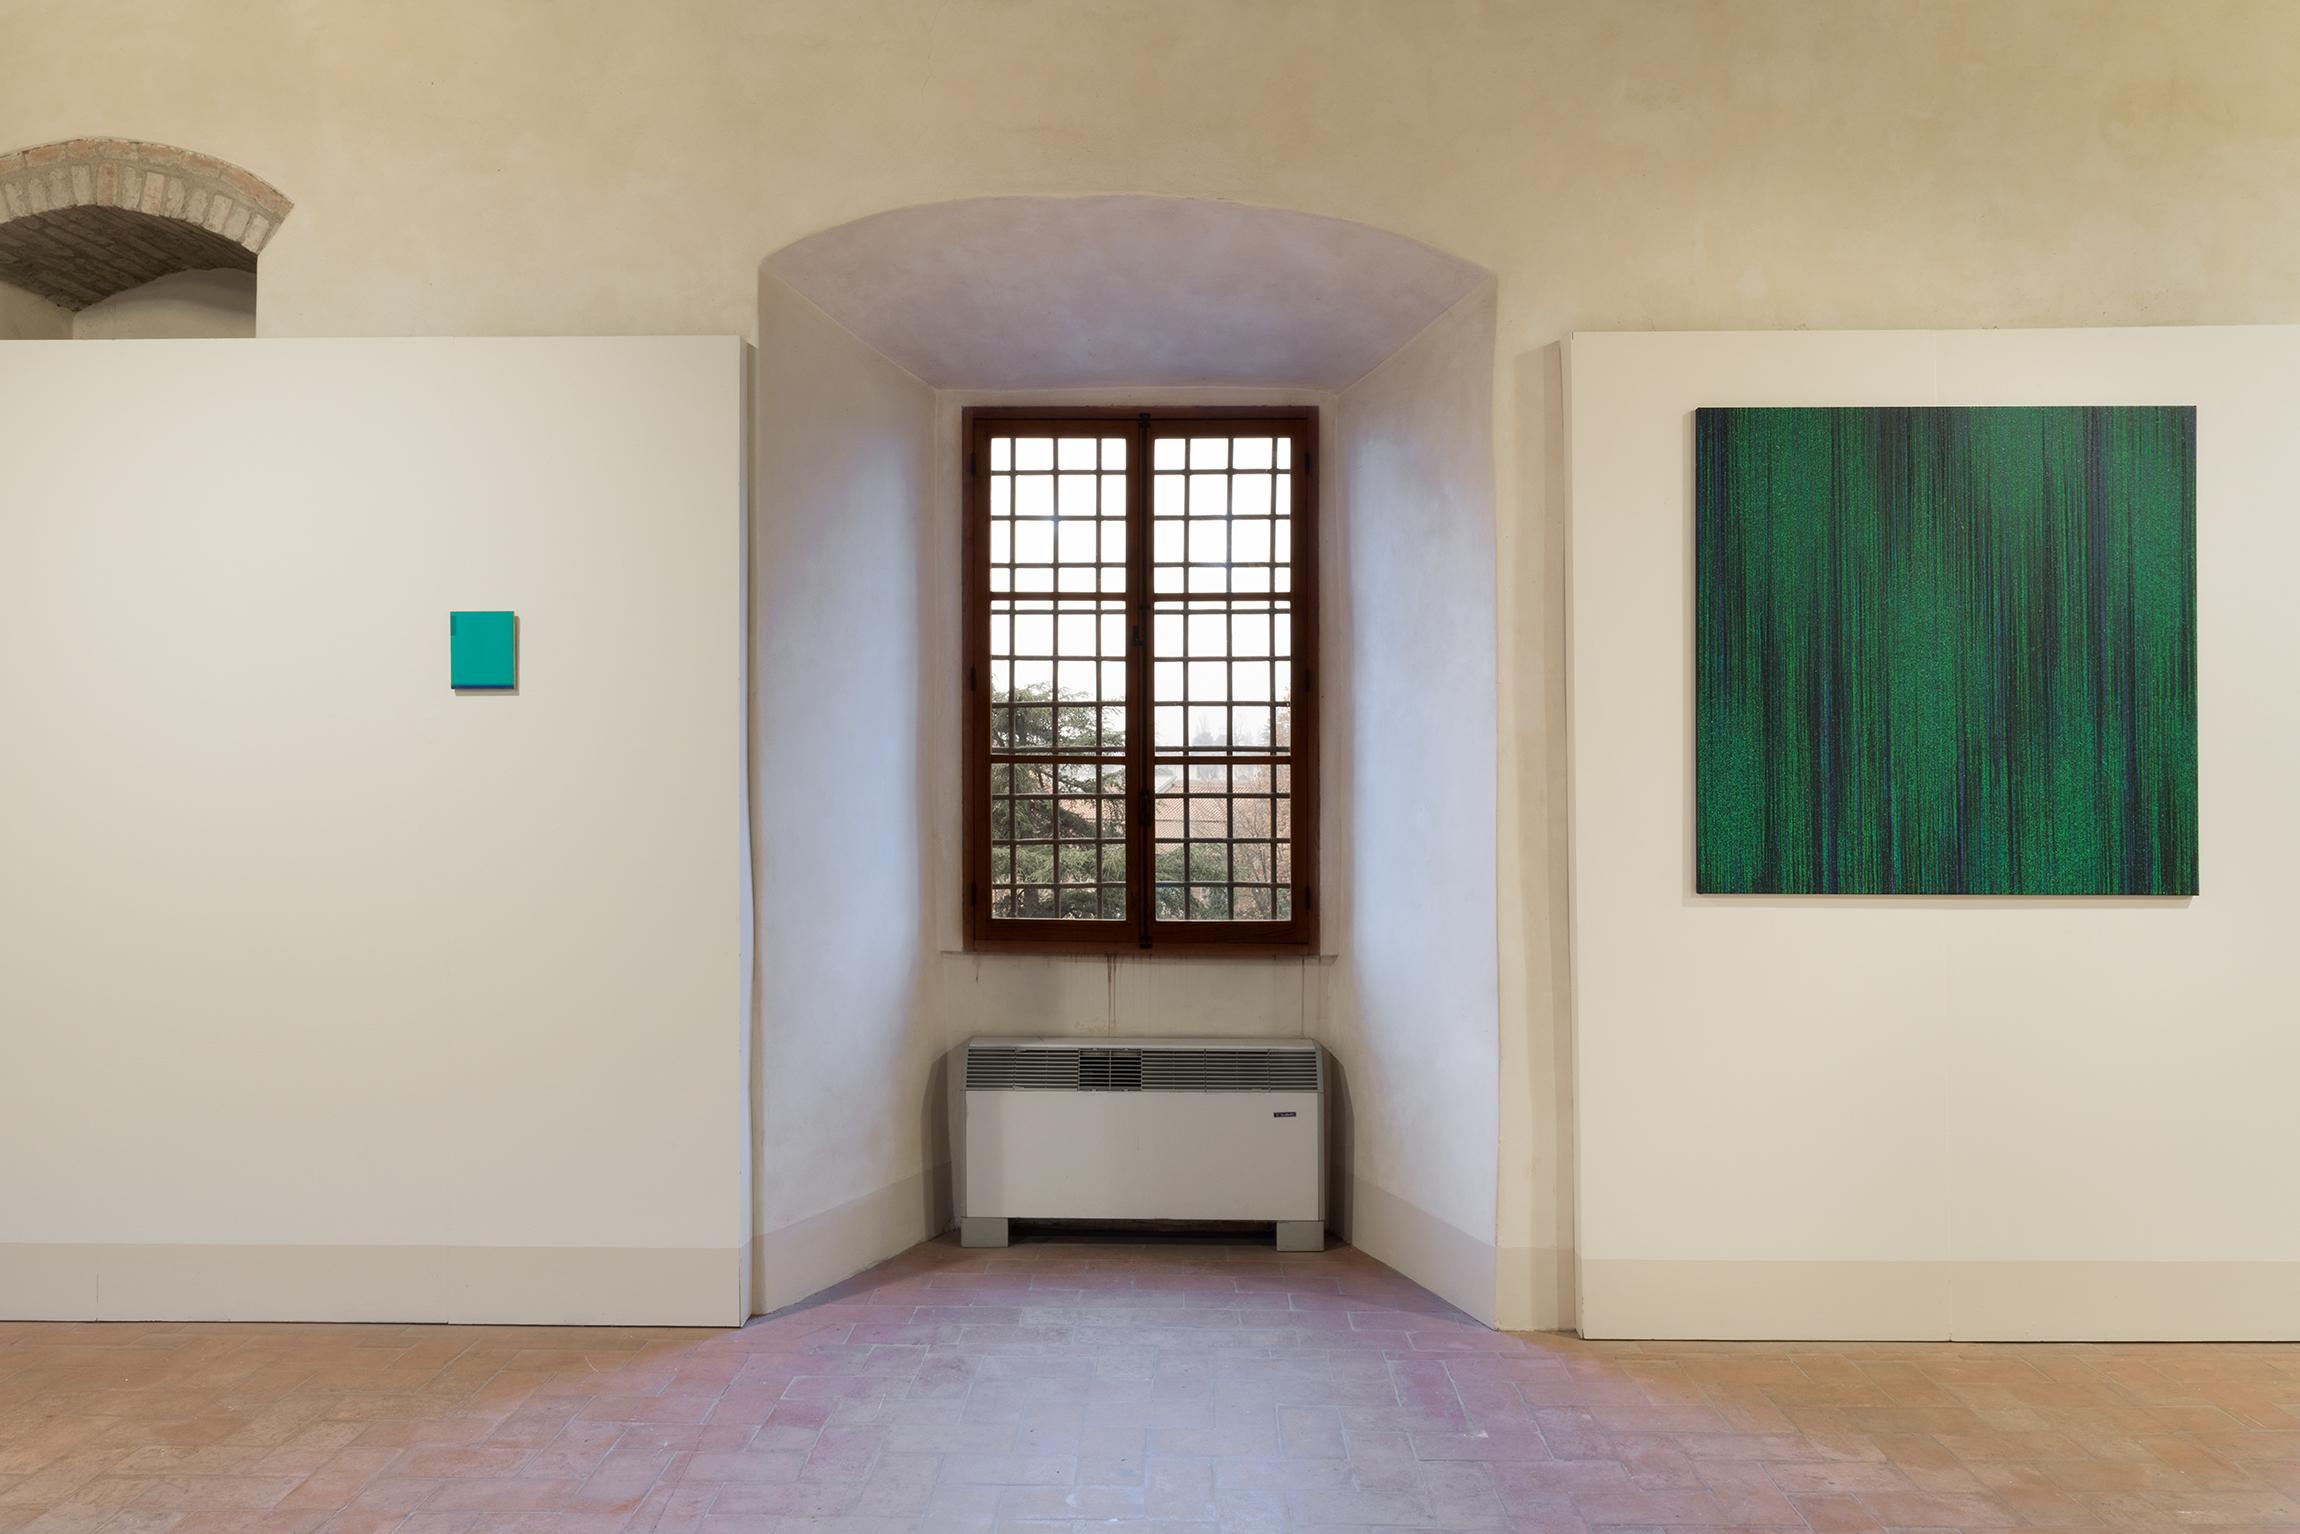 6. Luca Macauda - Ciane - vista della mostra - 2018